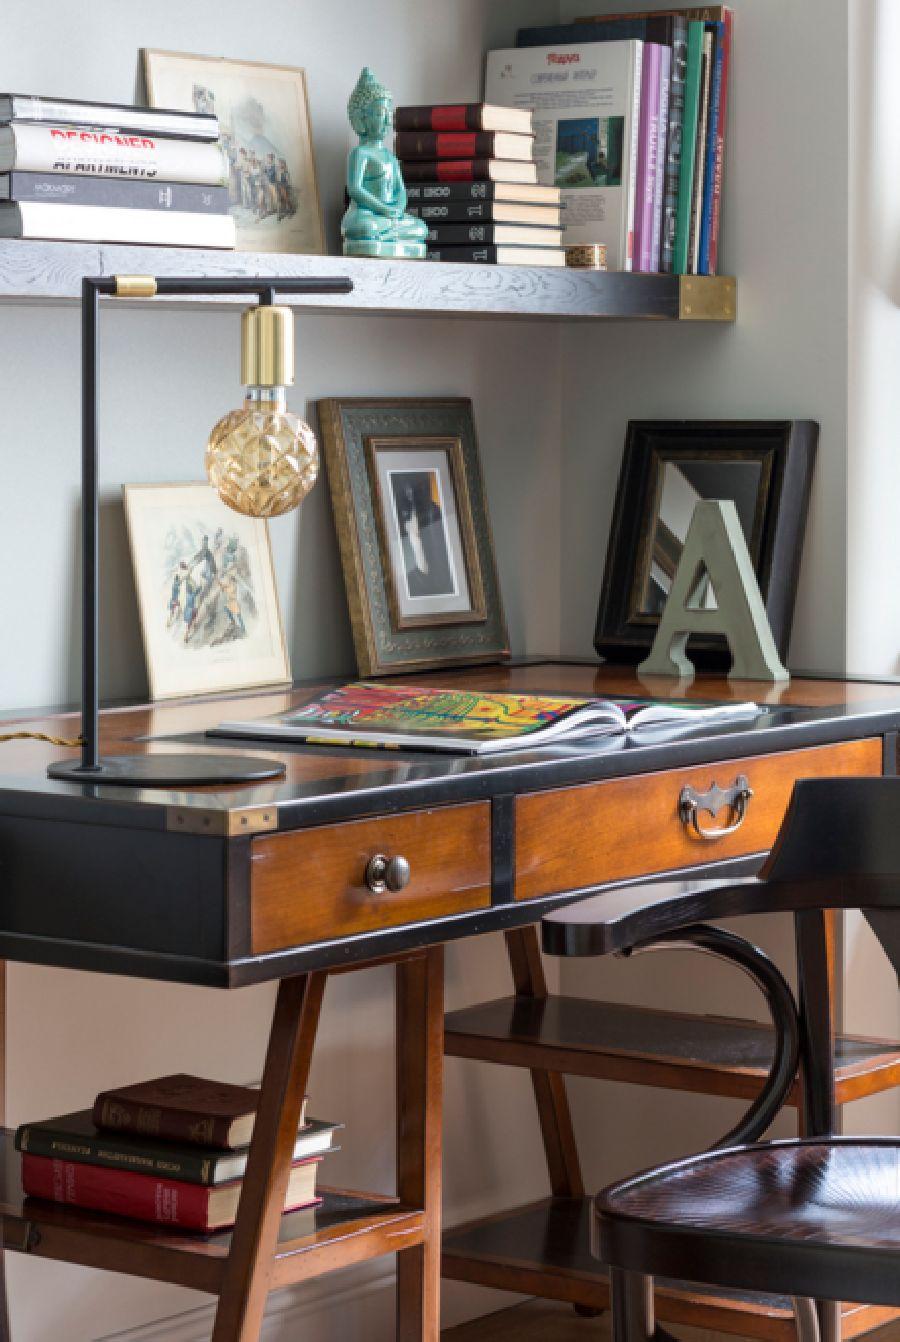 adelaparvu.com despre apartament de 80 mp patrati cu aer rustic elegant, locuinta Rusia, designer Zhenya Zhdanova (22)